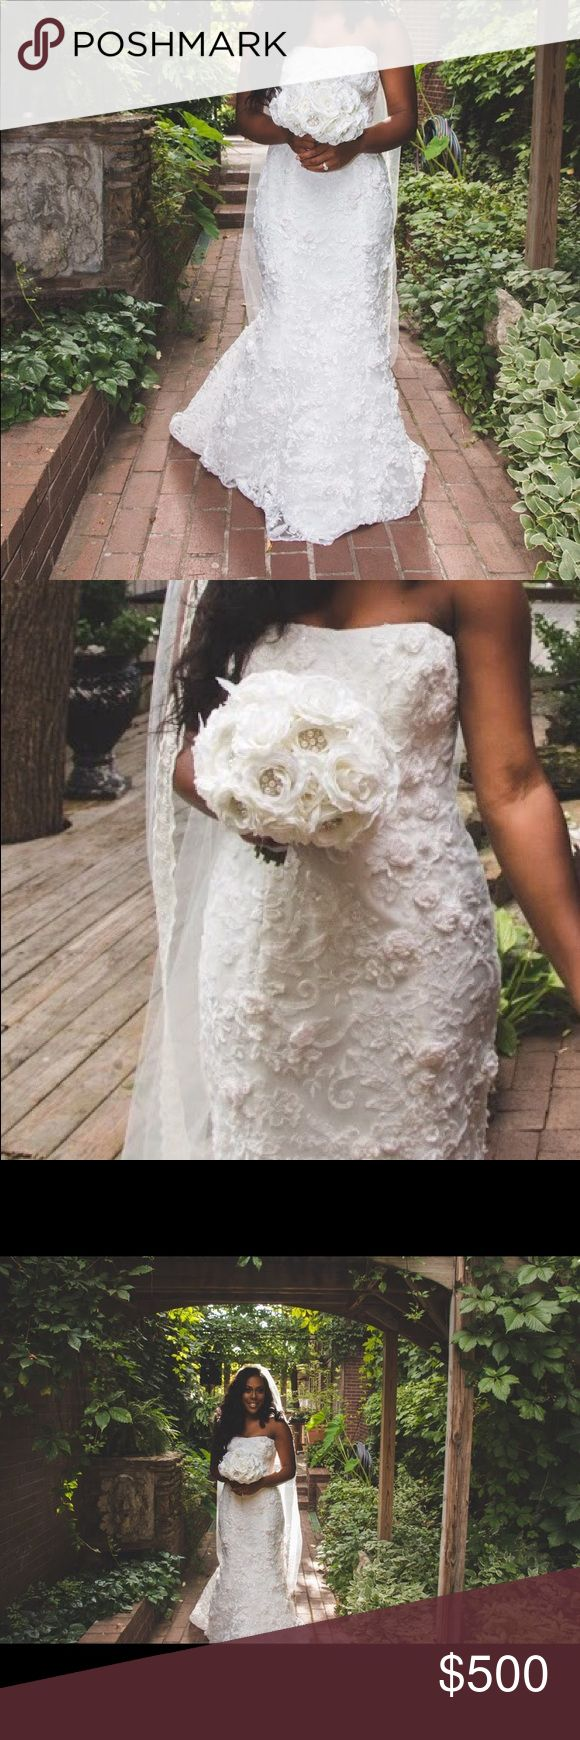 Oleg Cassini Wedding Gown Trumpet Gown with 3D Flowers  Size 10 Ivory Oleg Cassini Dresses Wedding